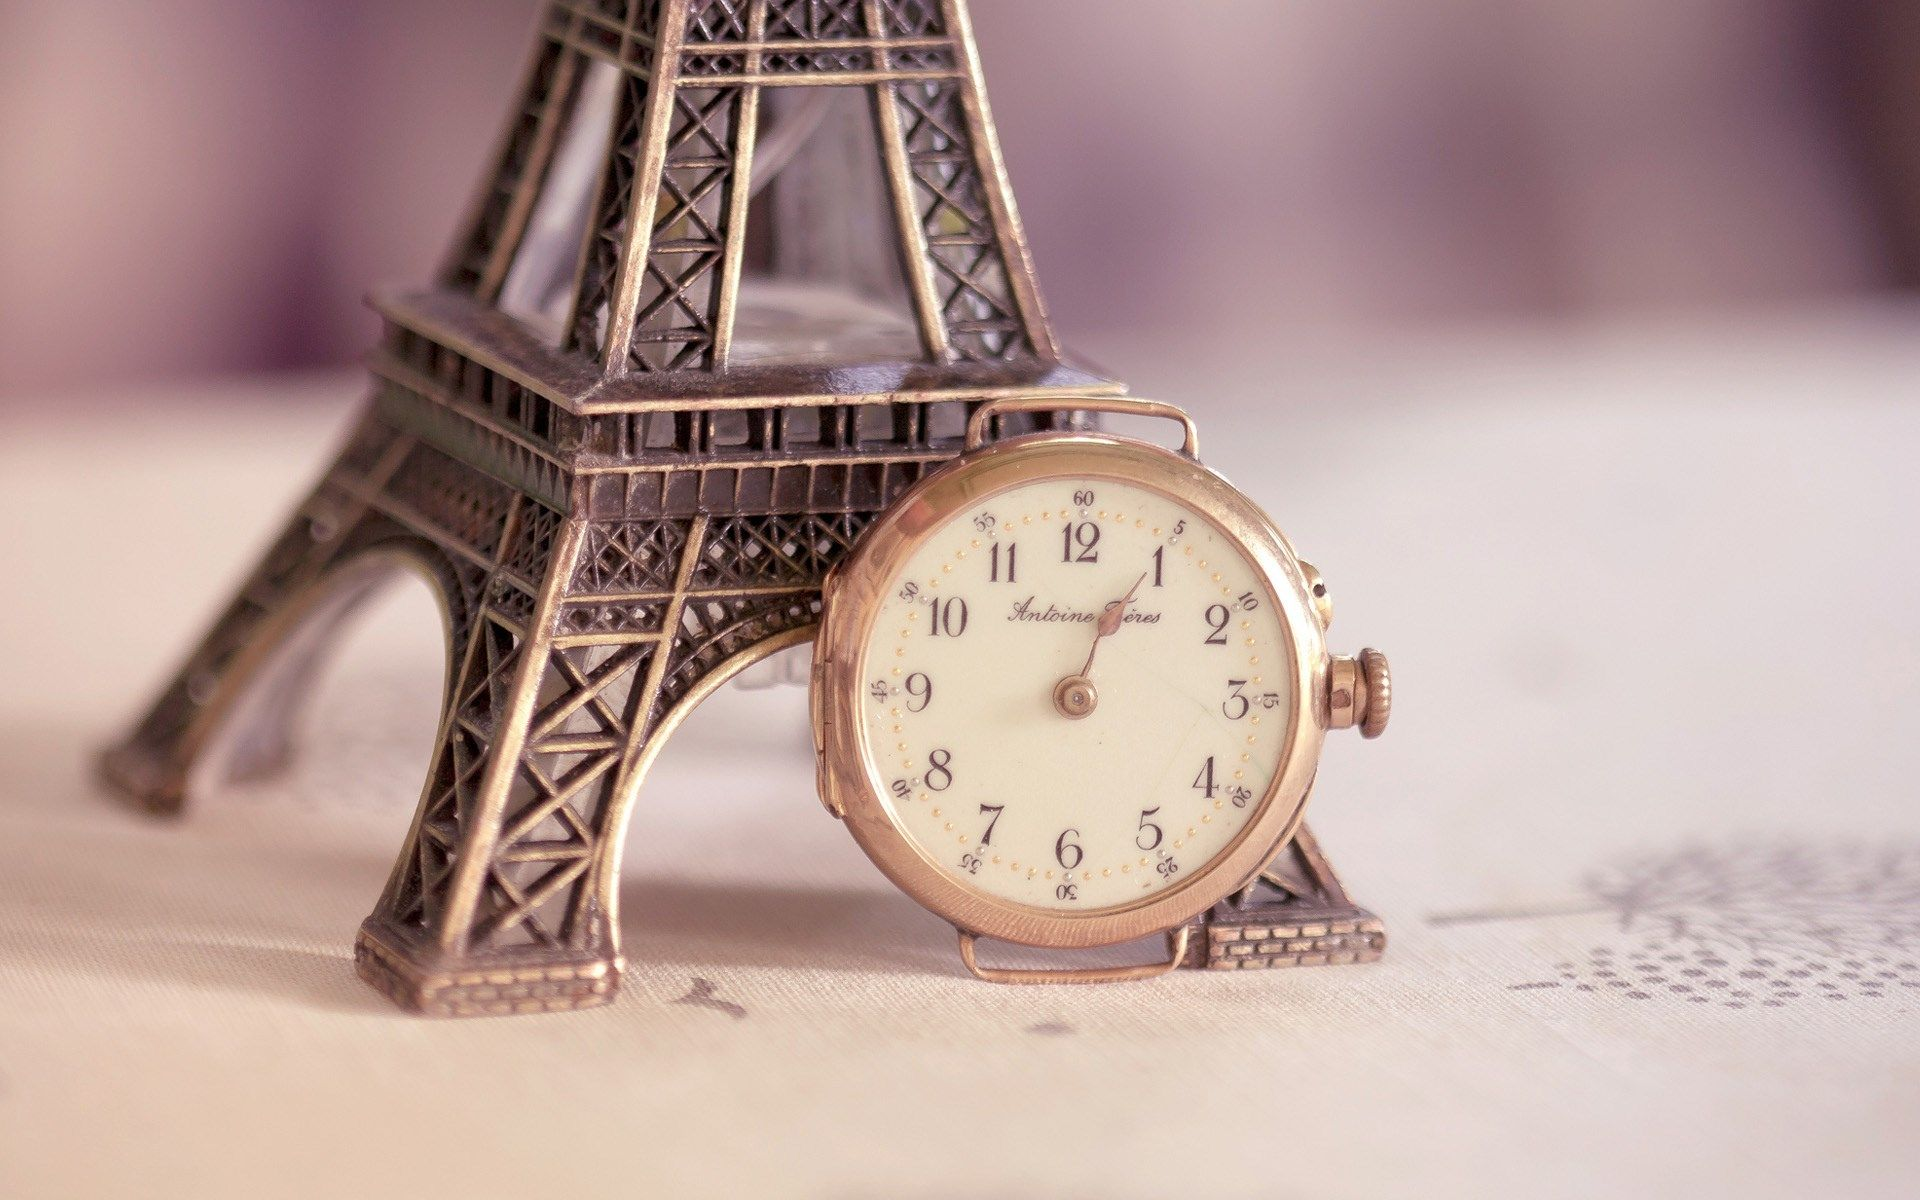 Hd Vintage Alarm Clock Wallpaper